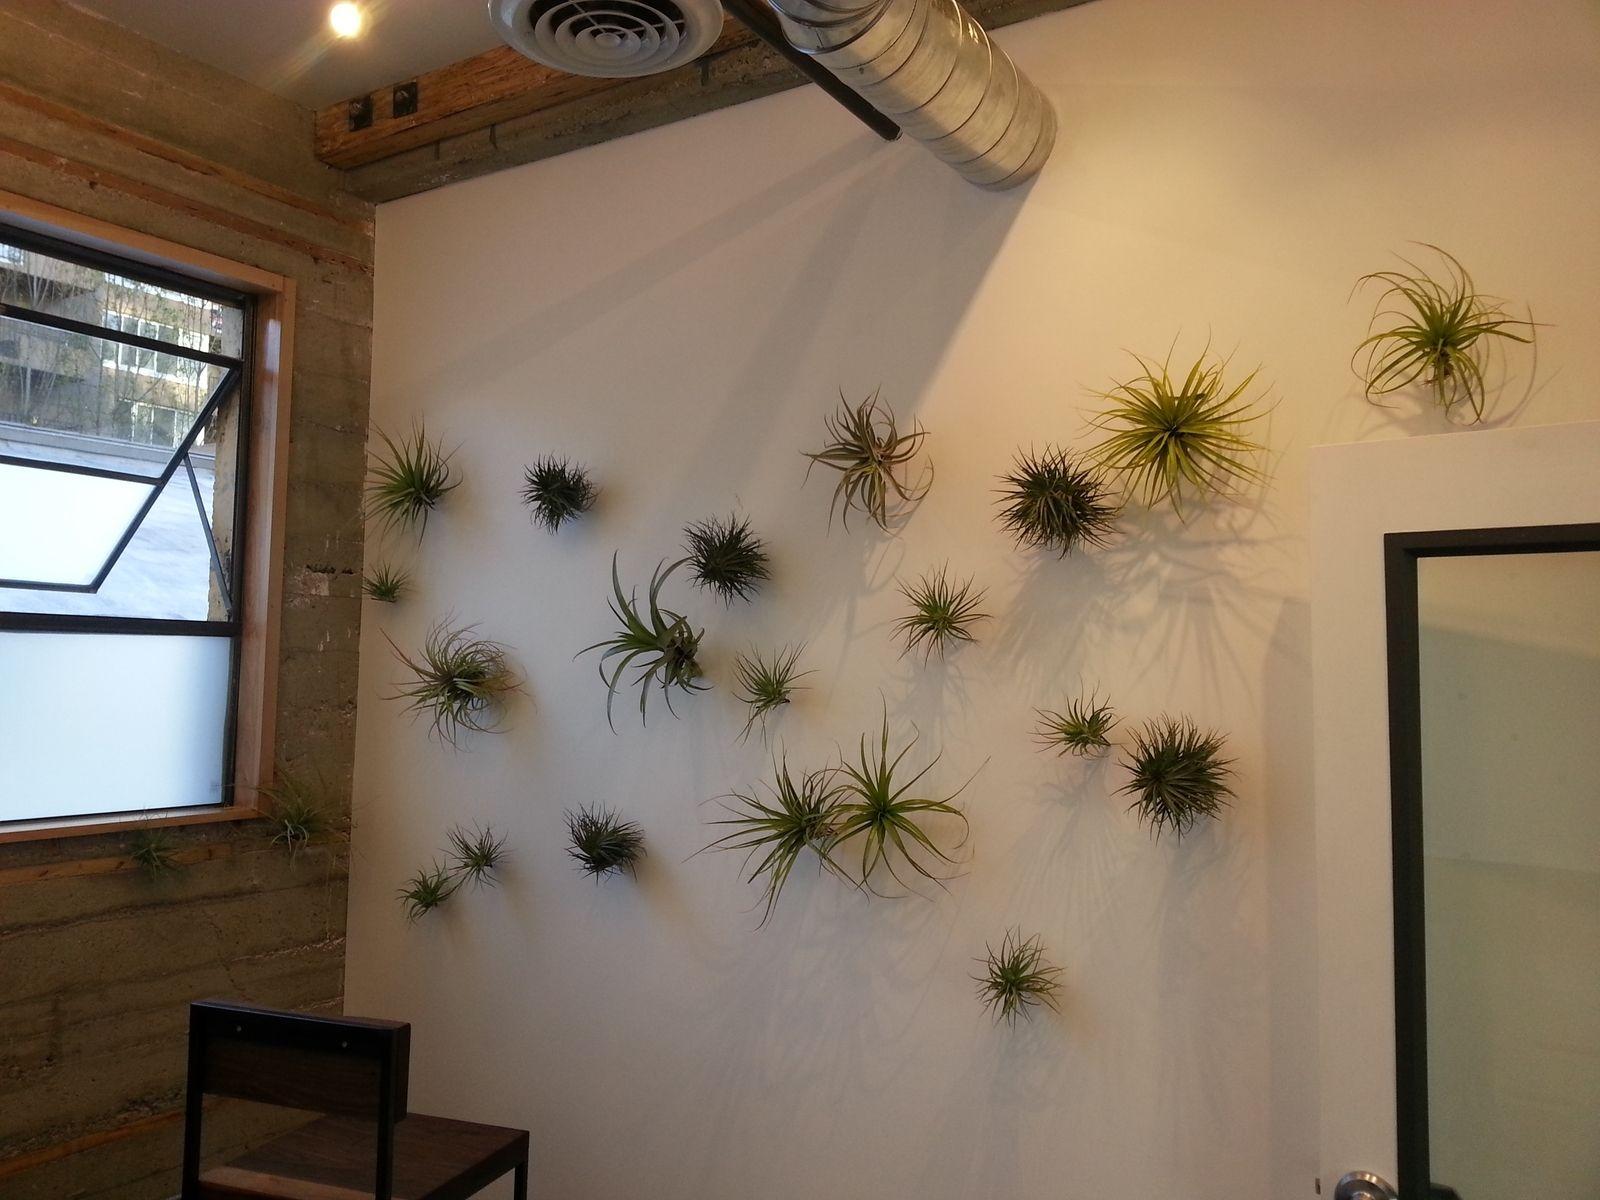 custom air plant installation by tres piedras design. Black Bedroom Furniture Sets. Home Design Ideas